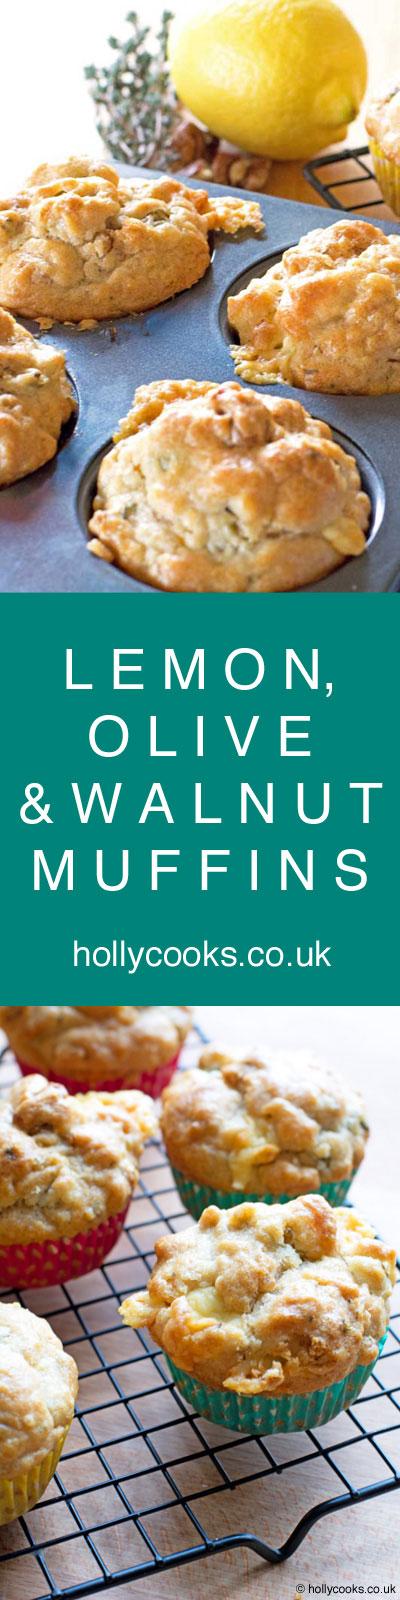 Lemon, olive and walnut muffins